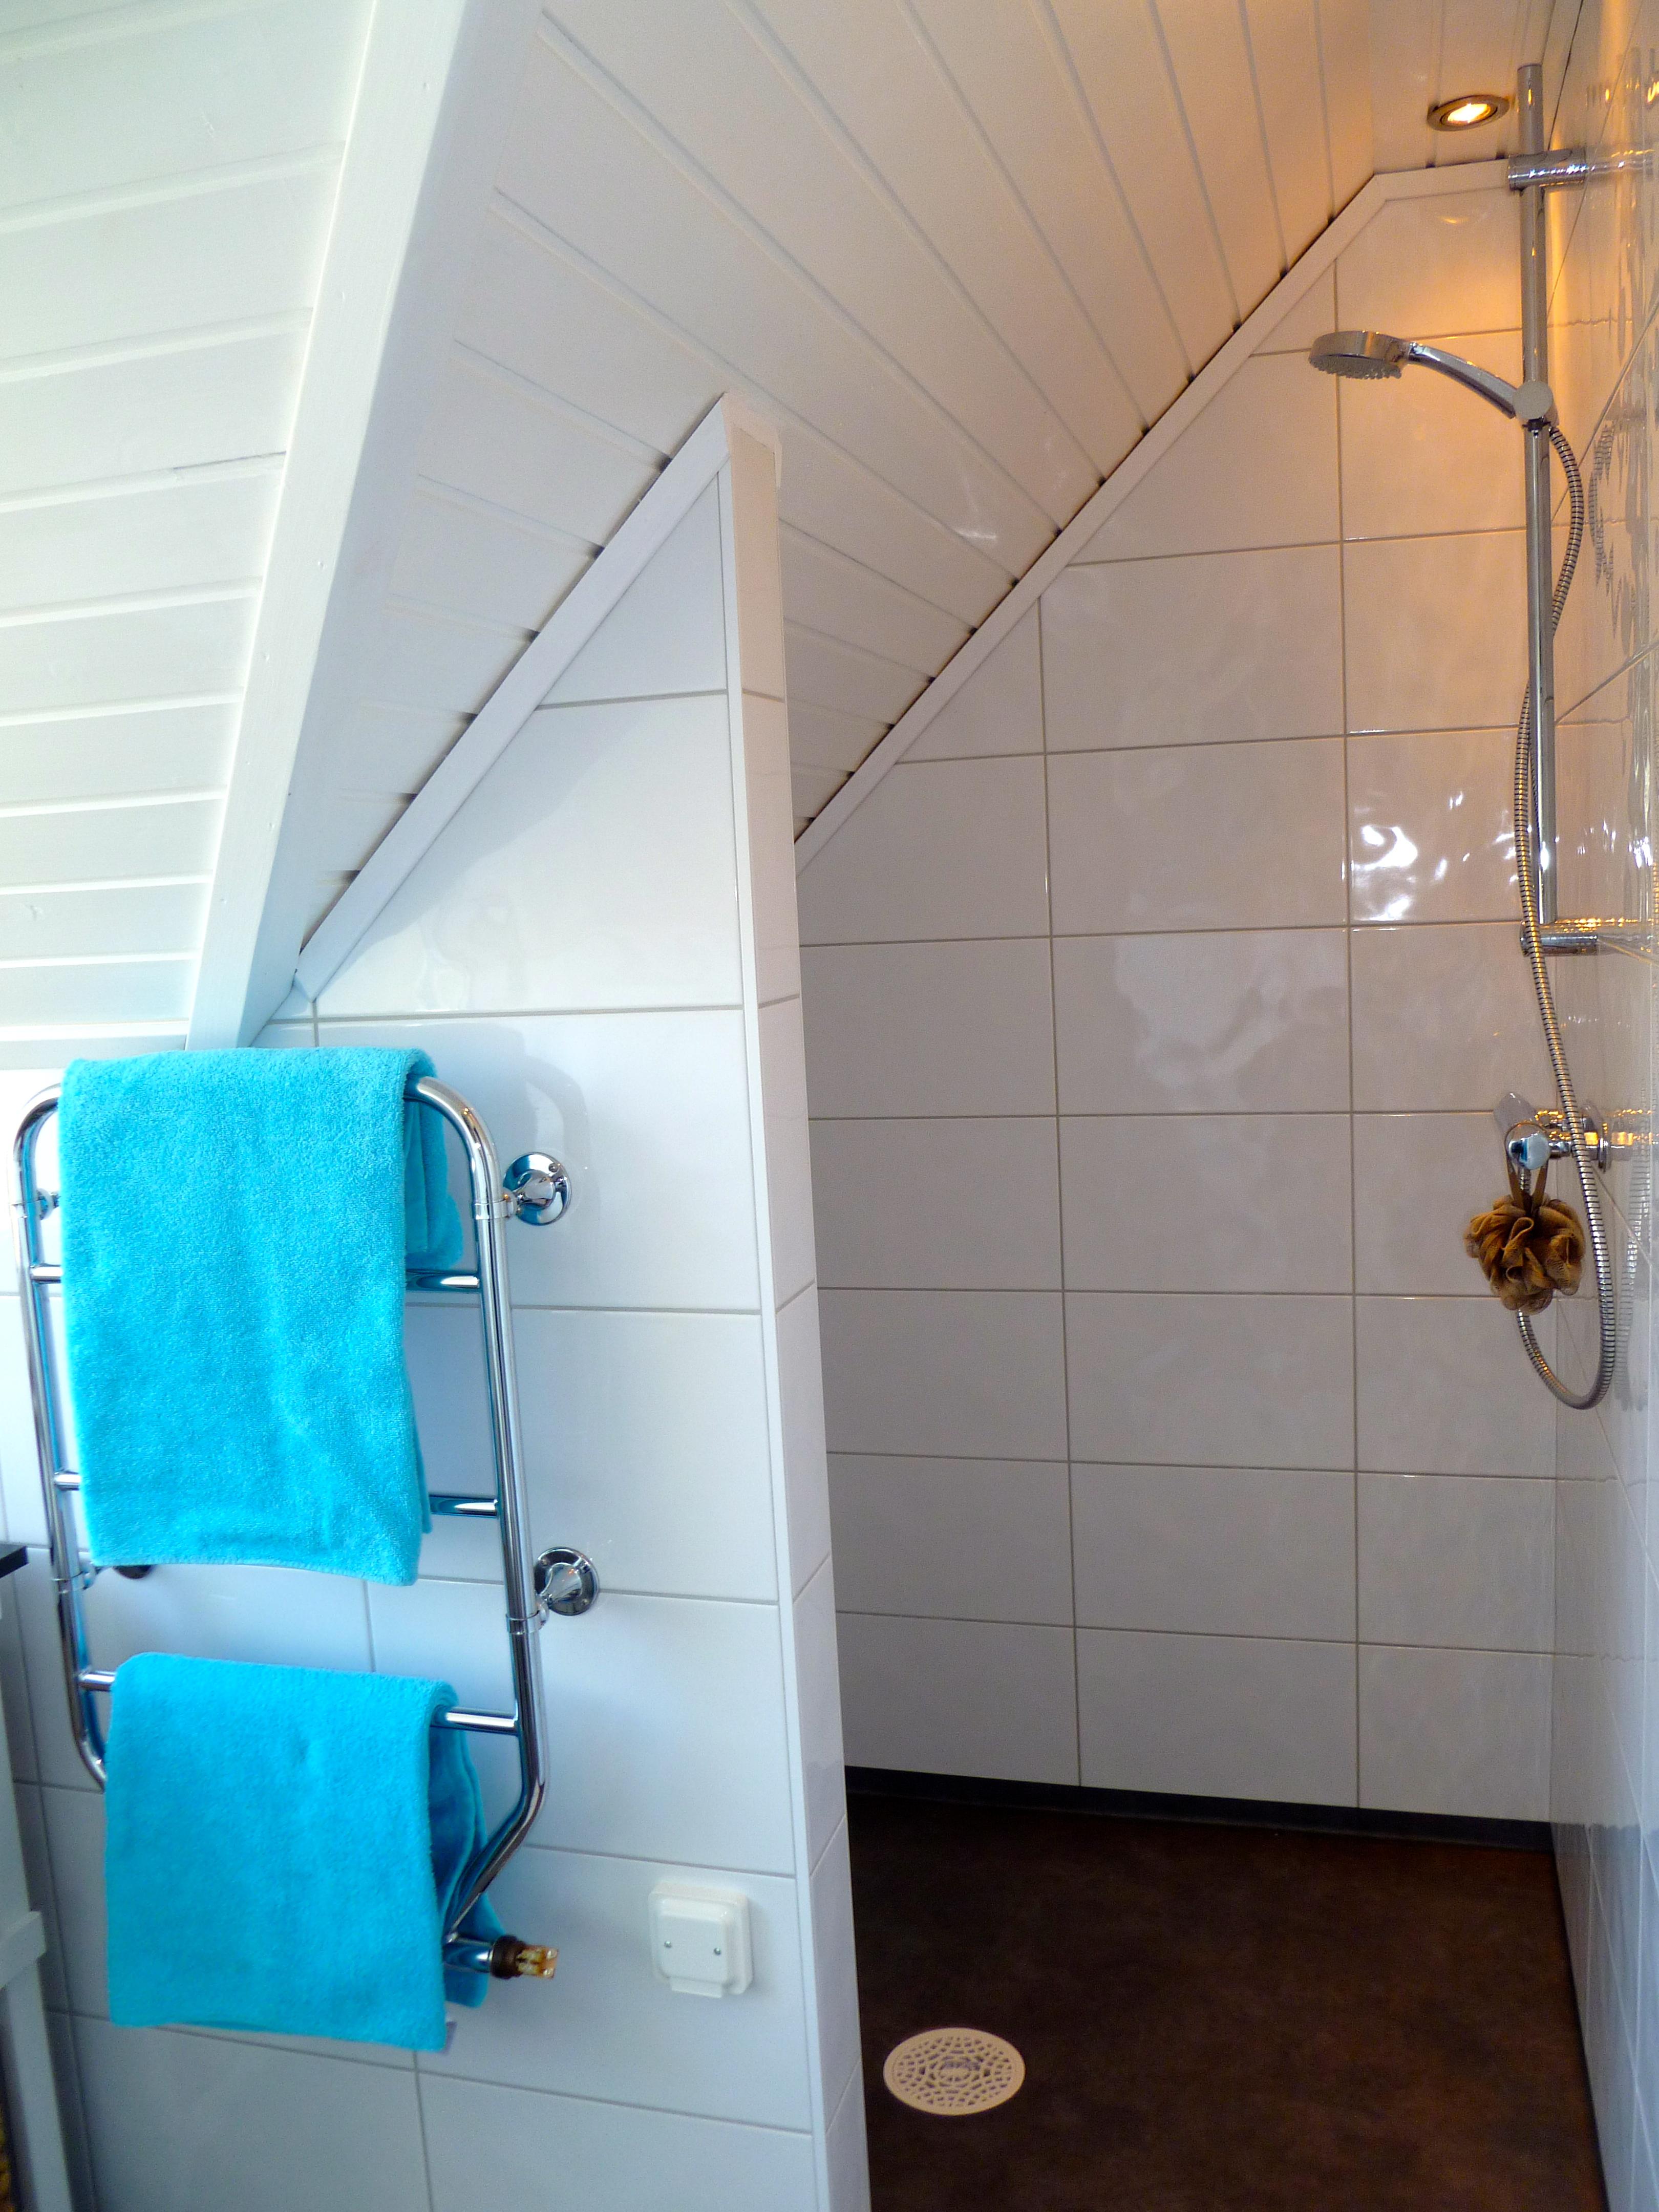 Vitt Furutak : Duschen sitter under snedtaket Hor har vi byggt en extra vogg som